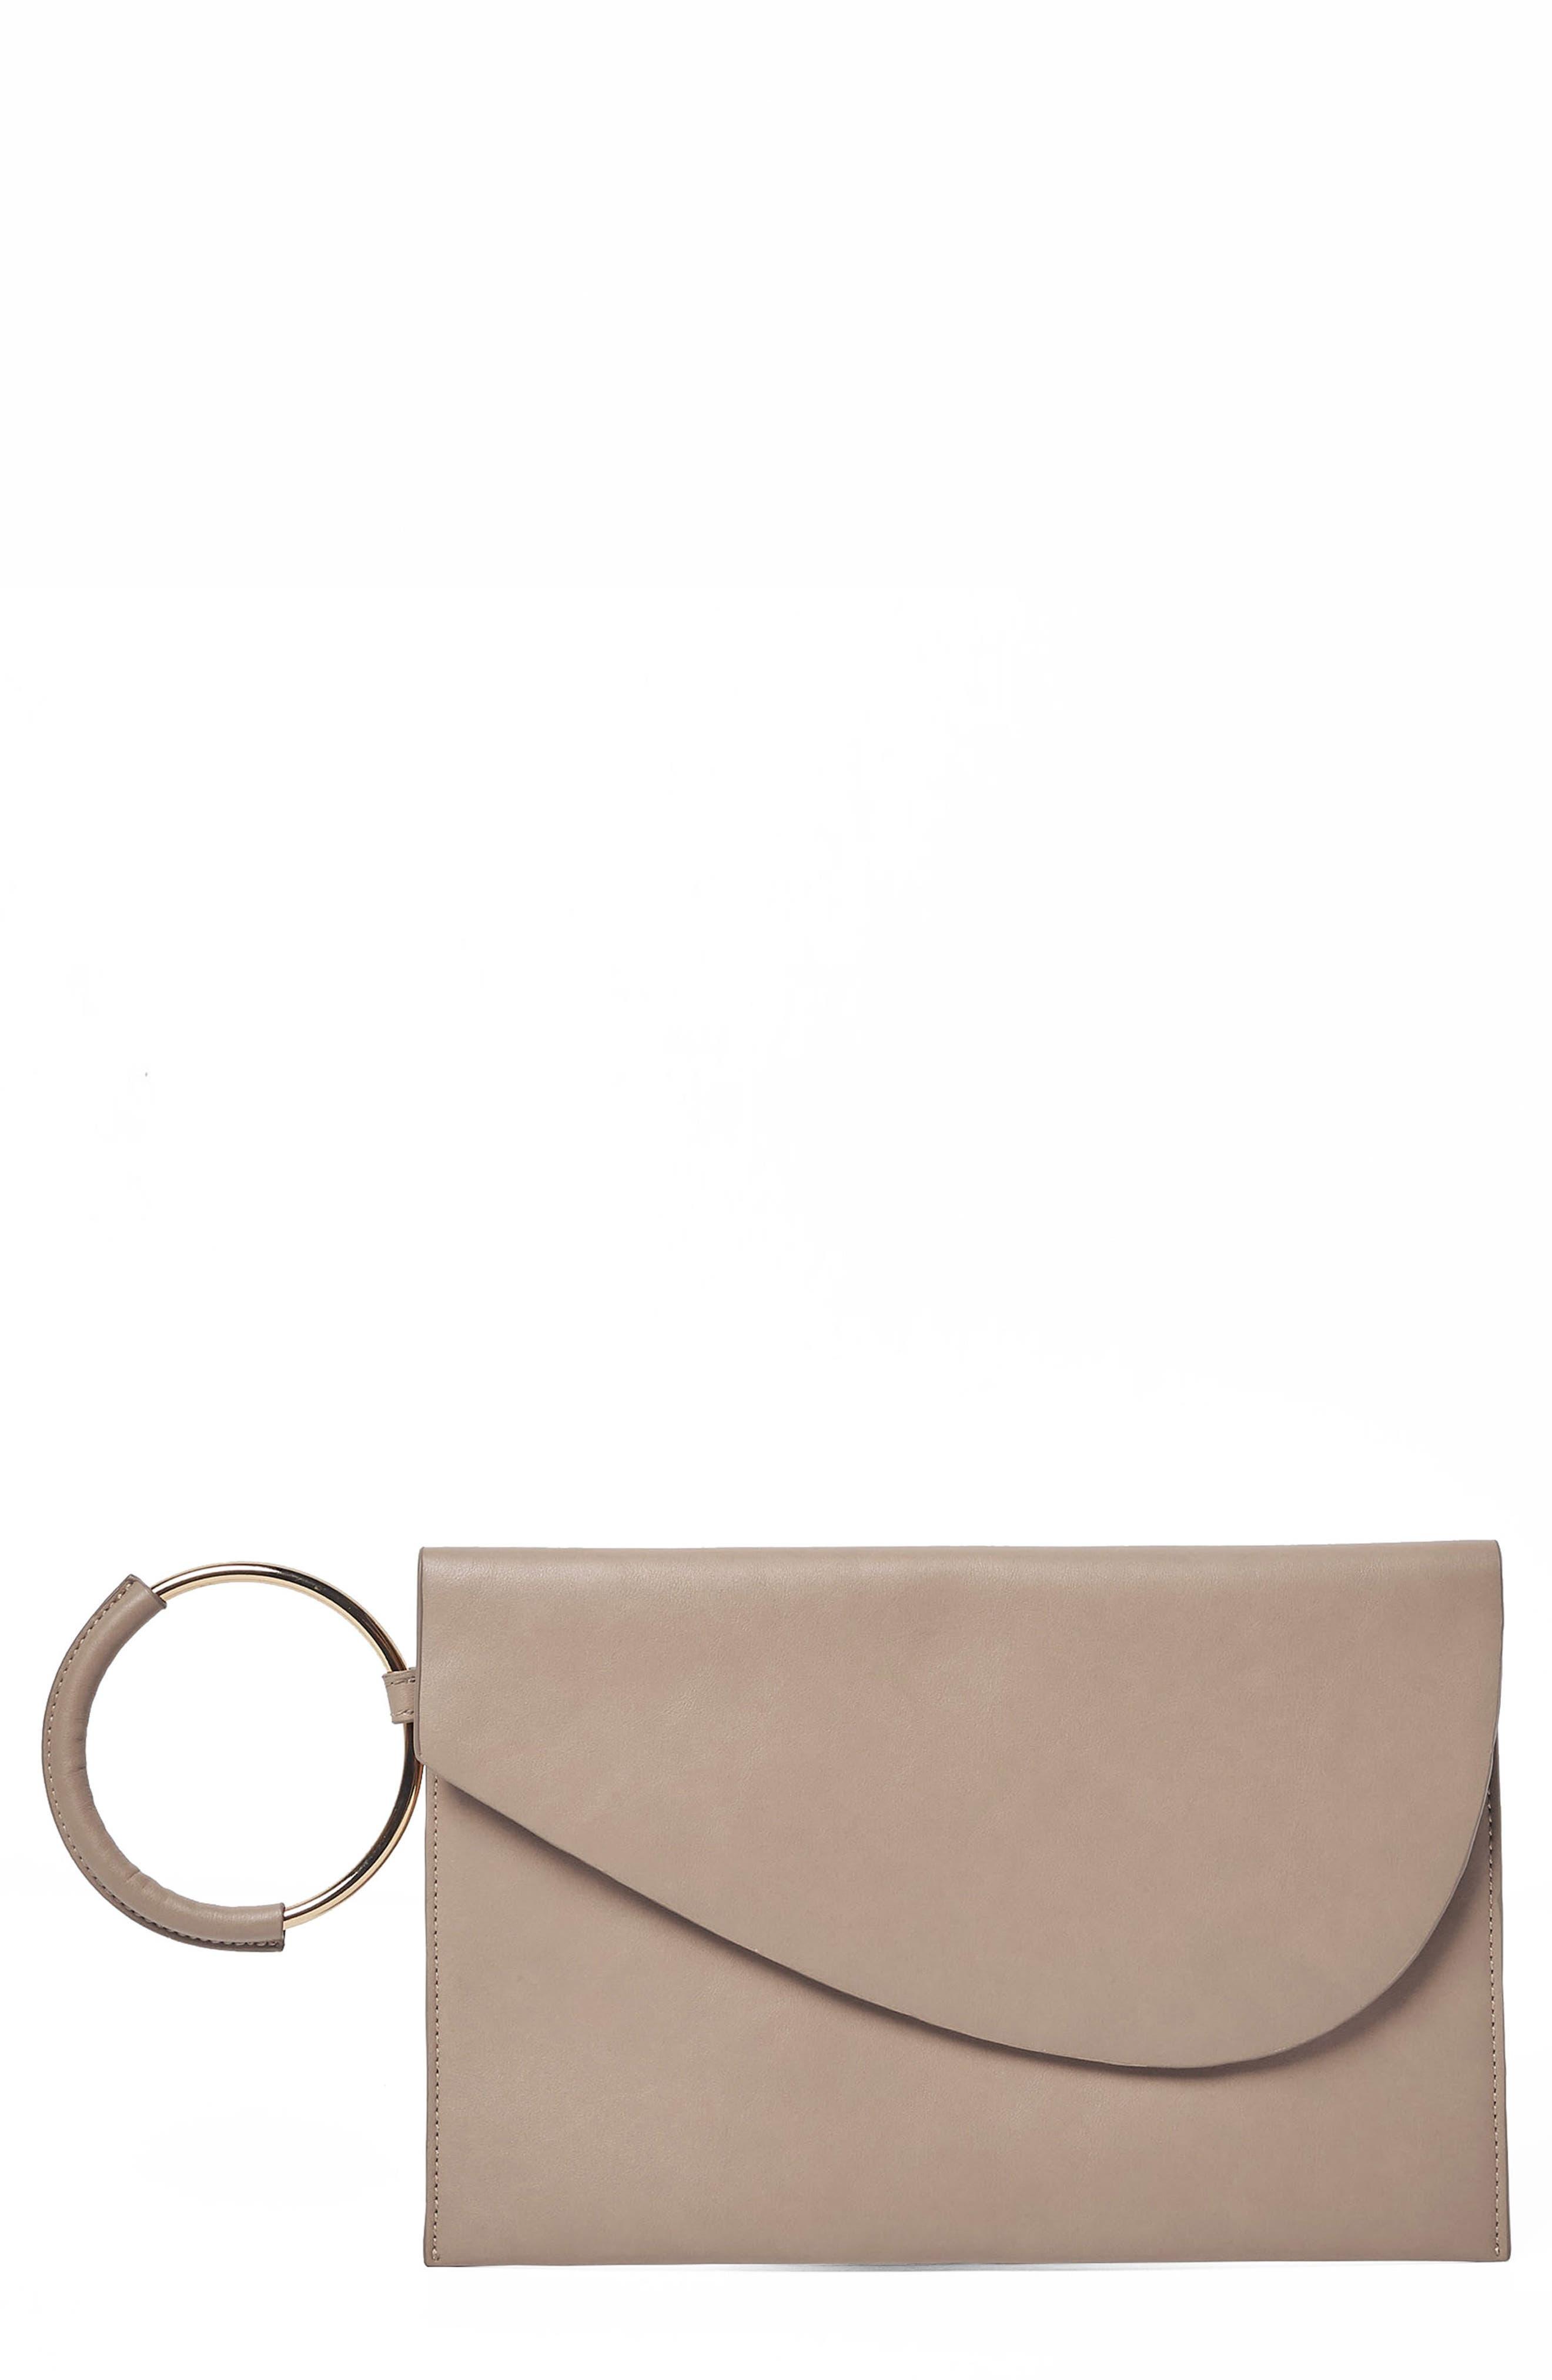 Paris Nights Vegan Leather Clutch,                         Main,                         color, Mid Grey